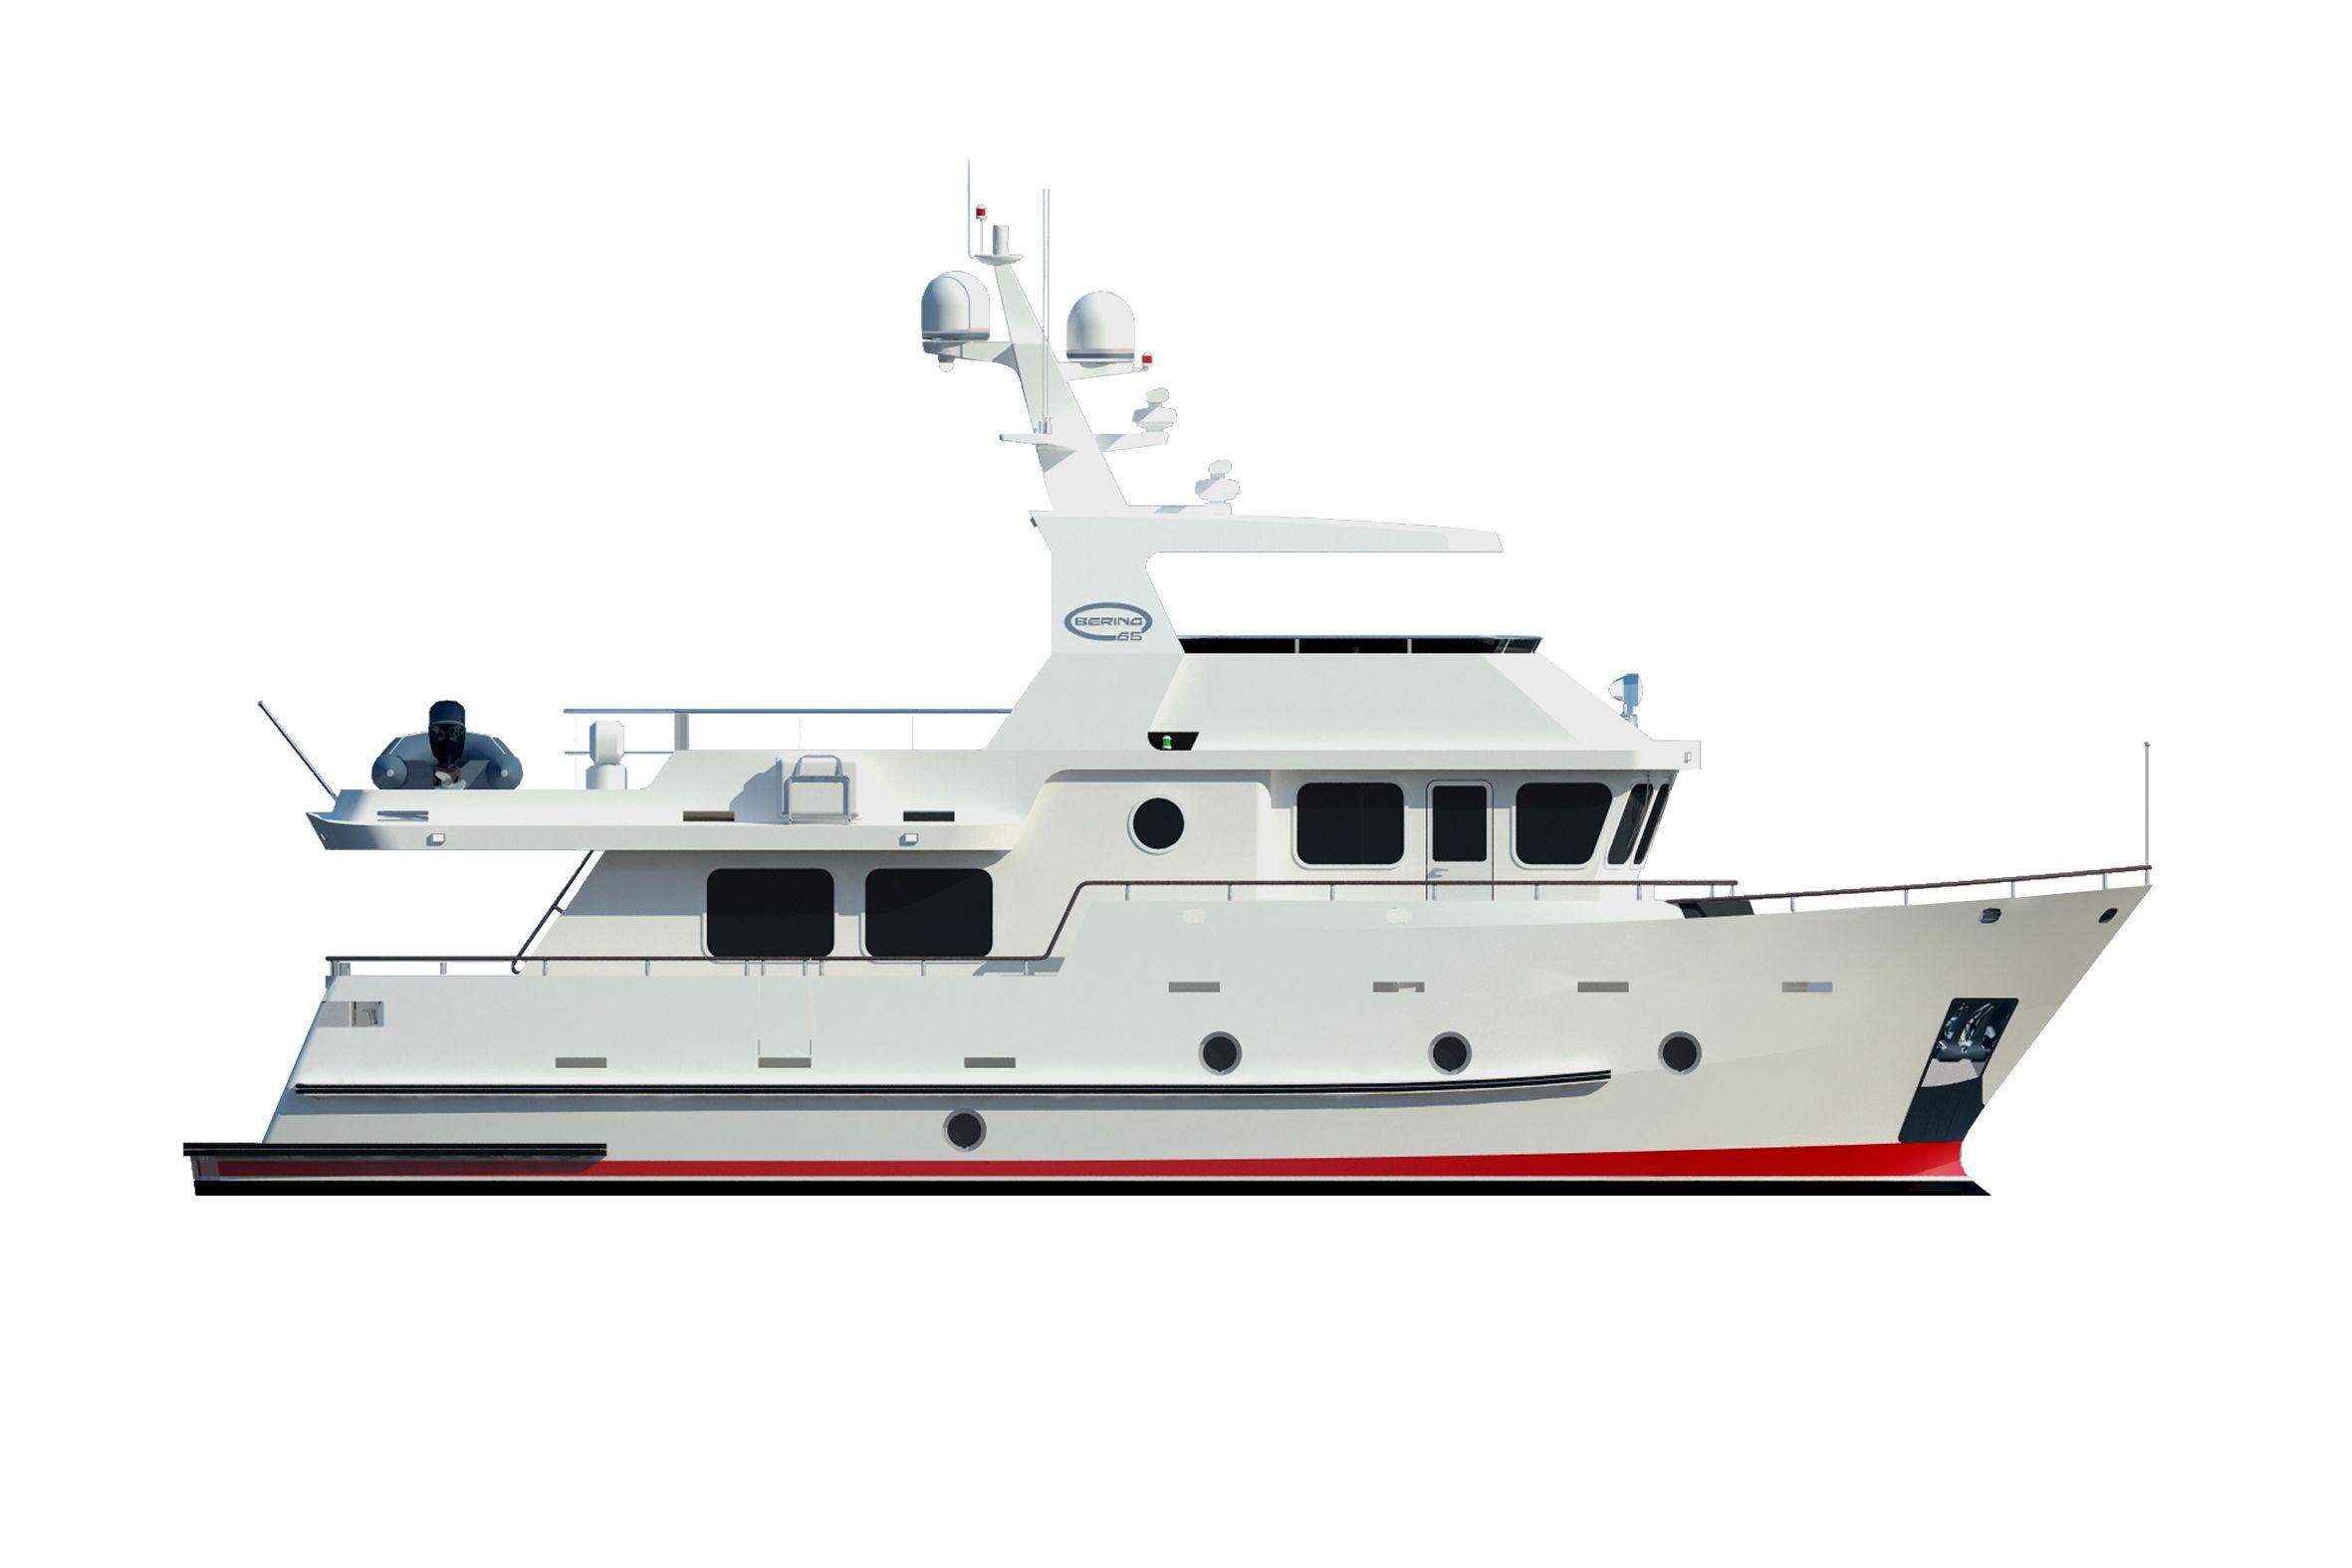 Bering 80 Oceanic Yacht | Luxury Yacht | Bering Yachts